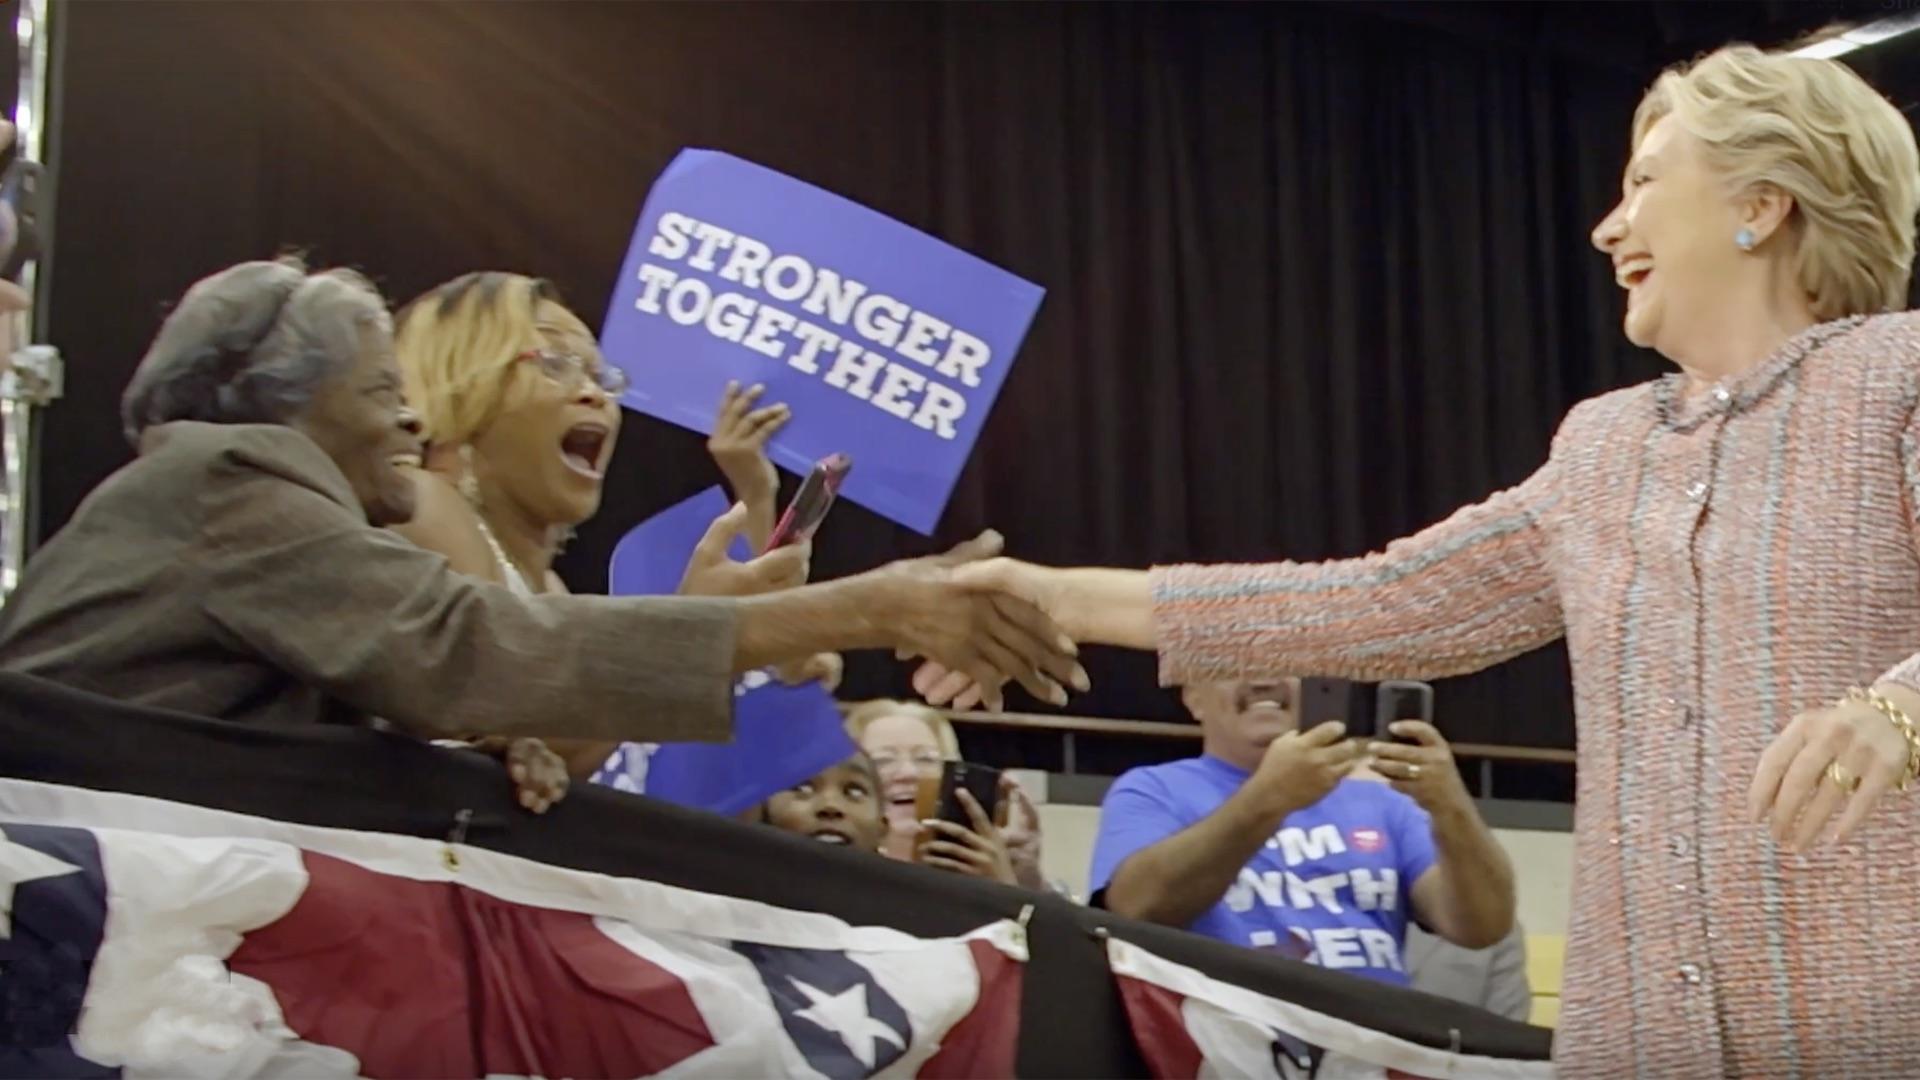 Roar: Hillary Clinton for America